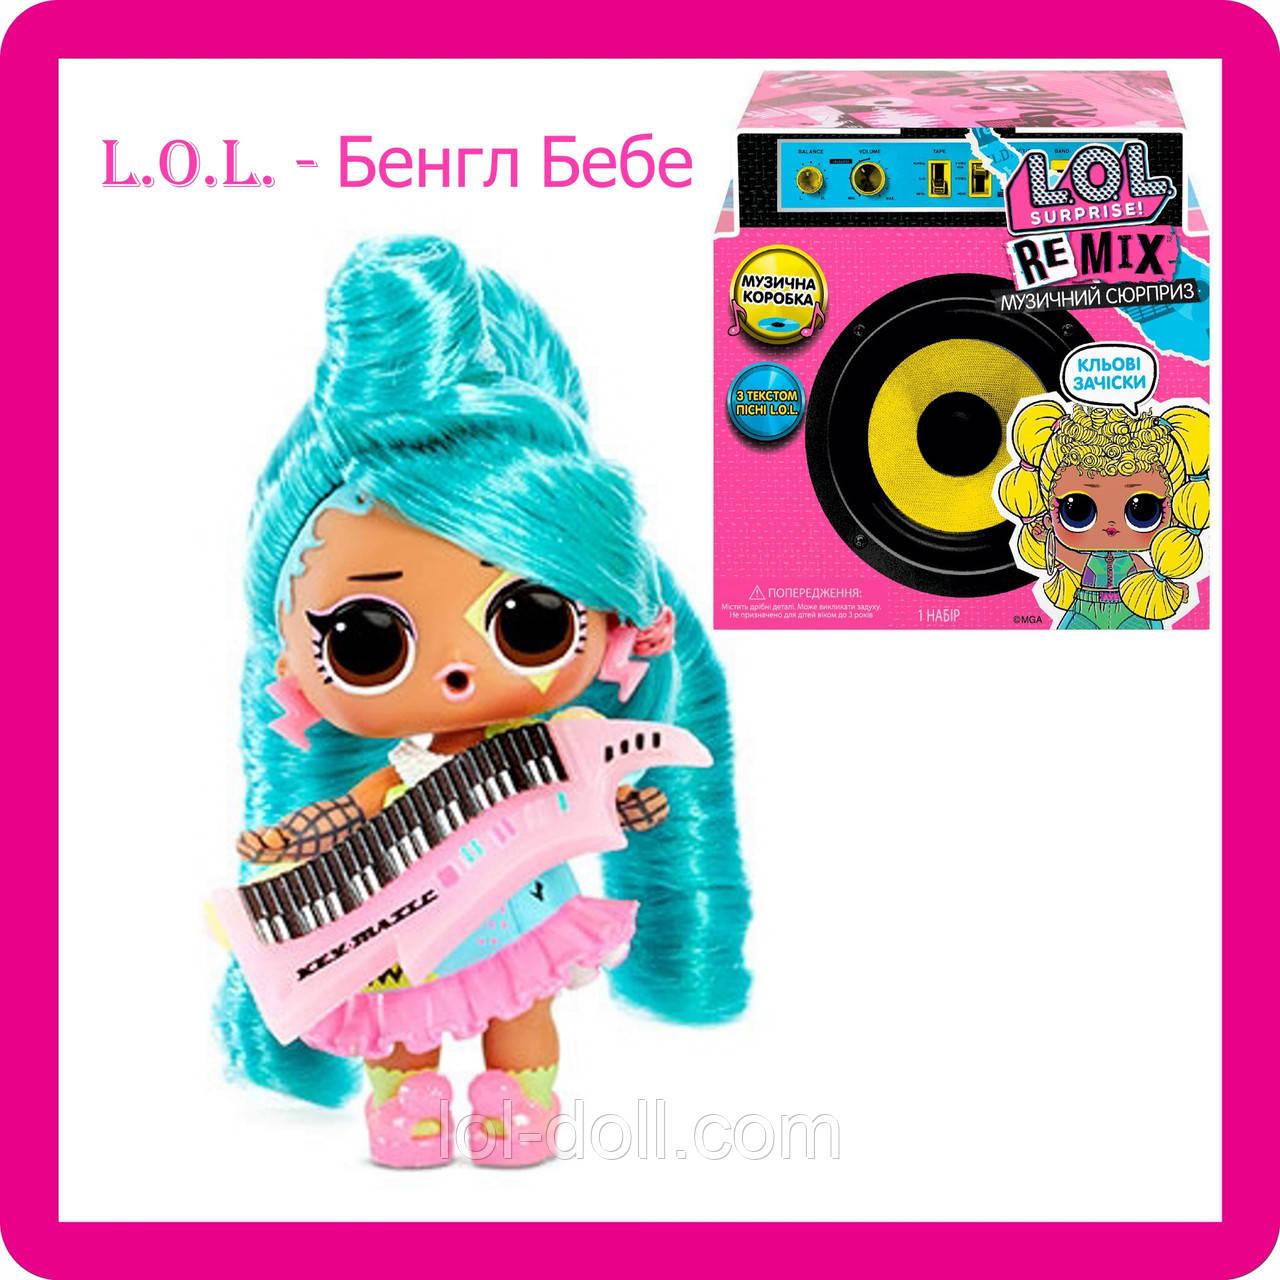 Кукла LOL Surprise Хеир Флип Бенгл Беби Лол Сюрприз Оригинал Hair Flip Bangle B.B.